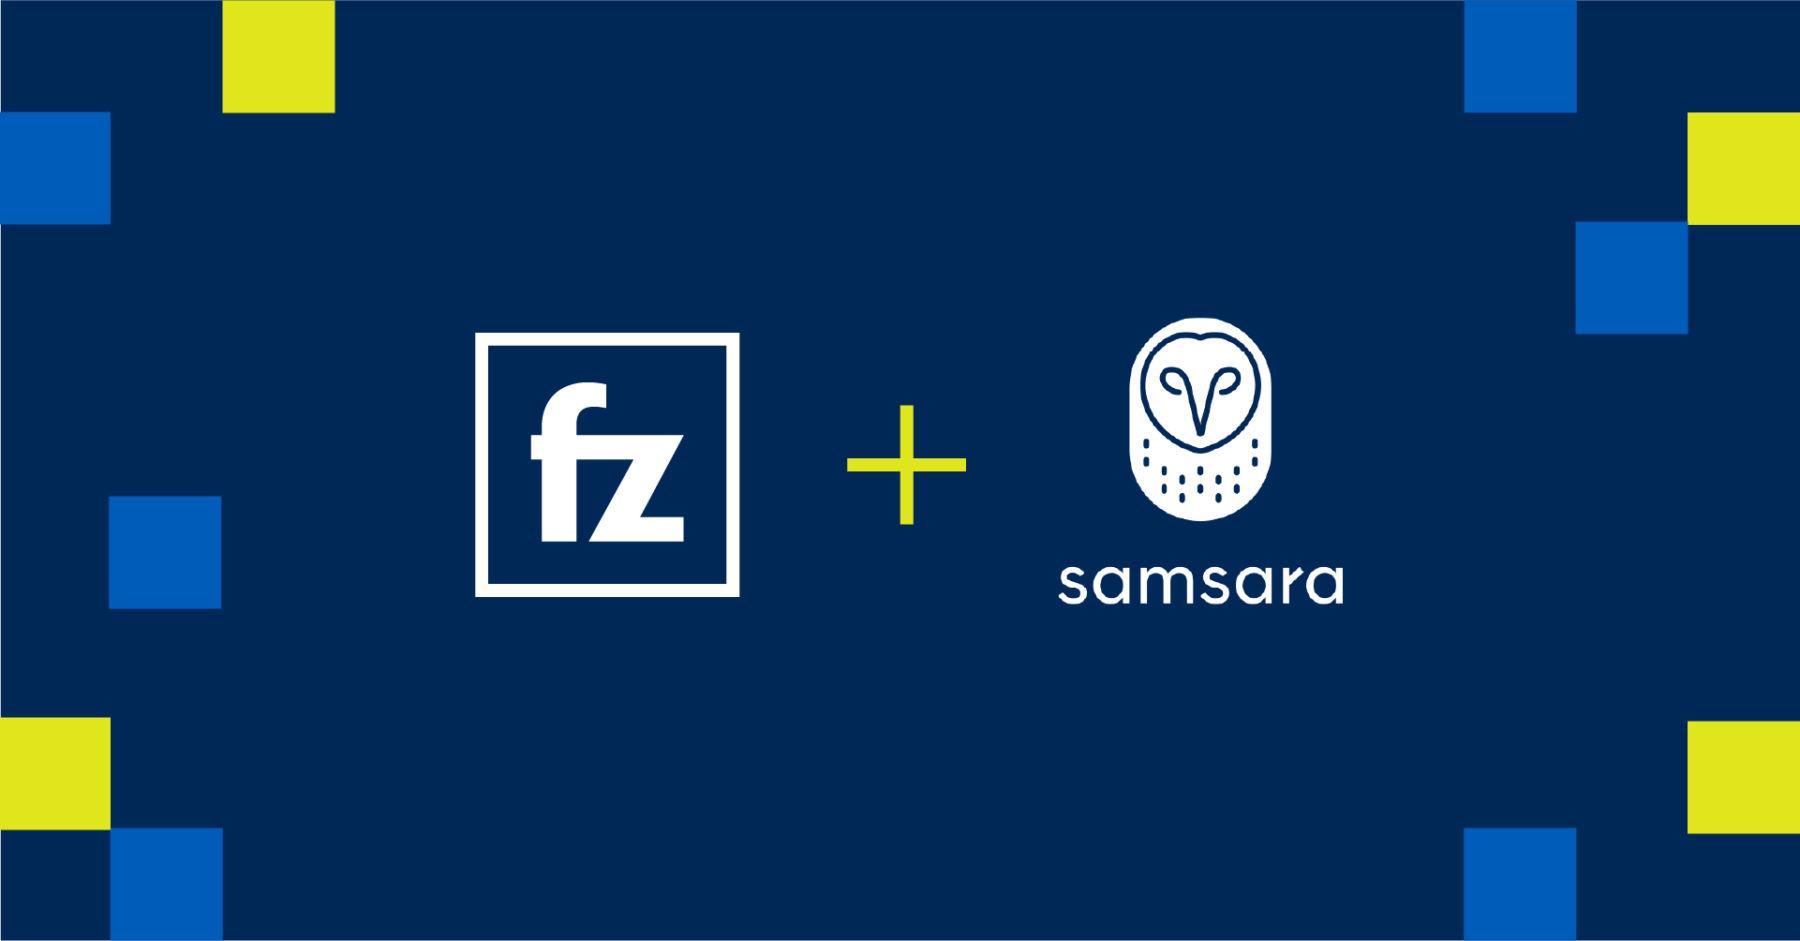 FZ Partners with Samsara